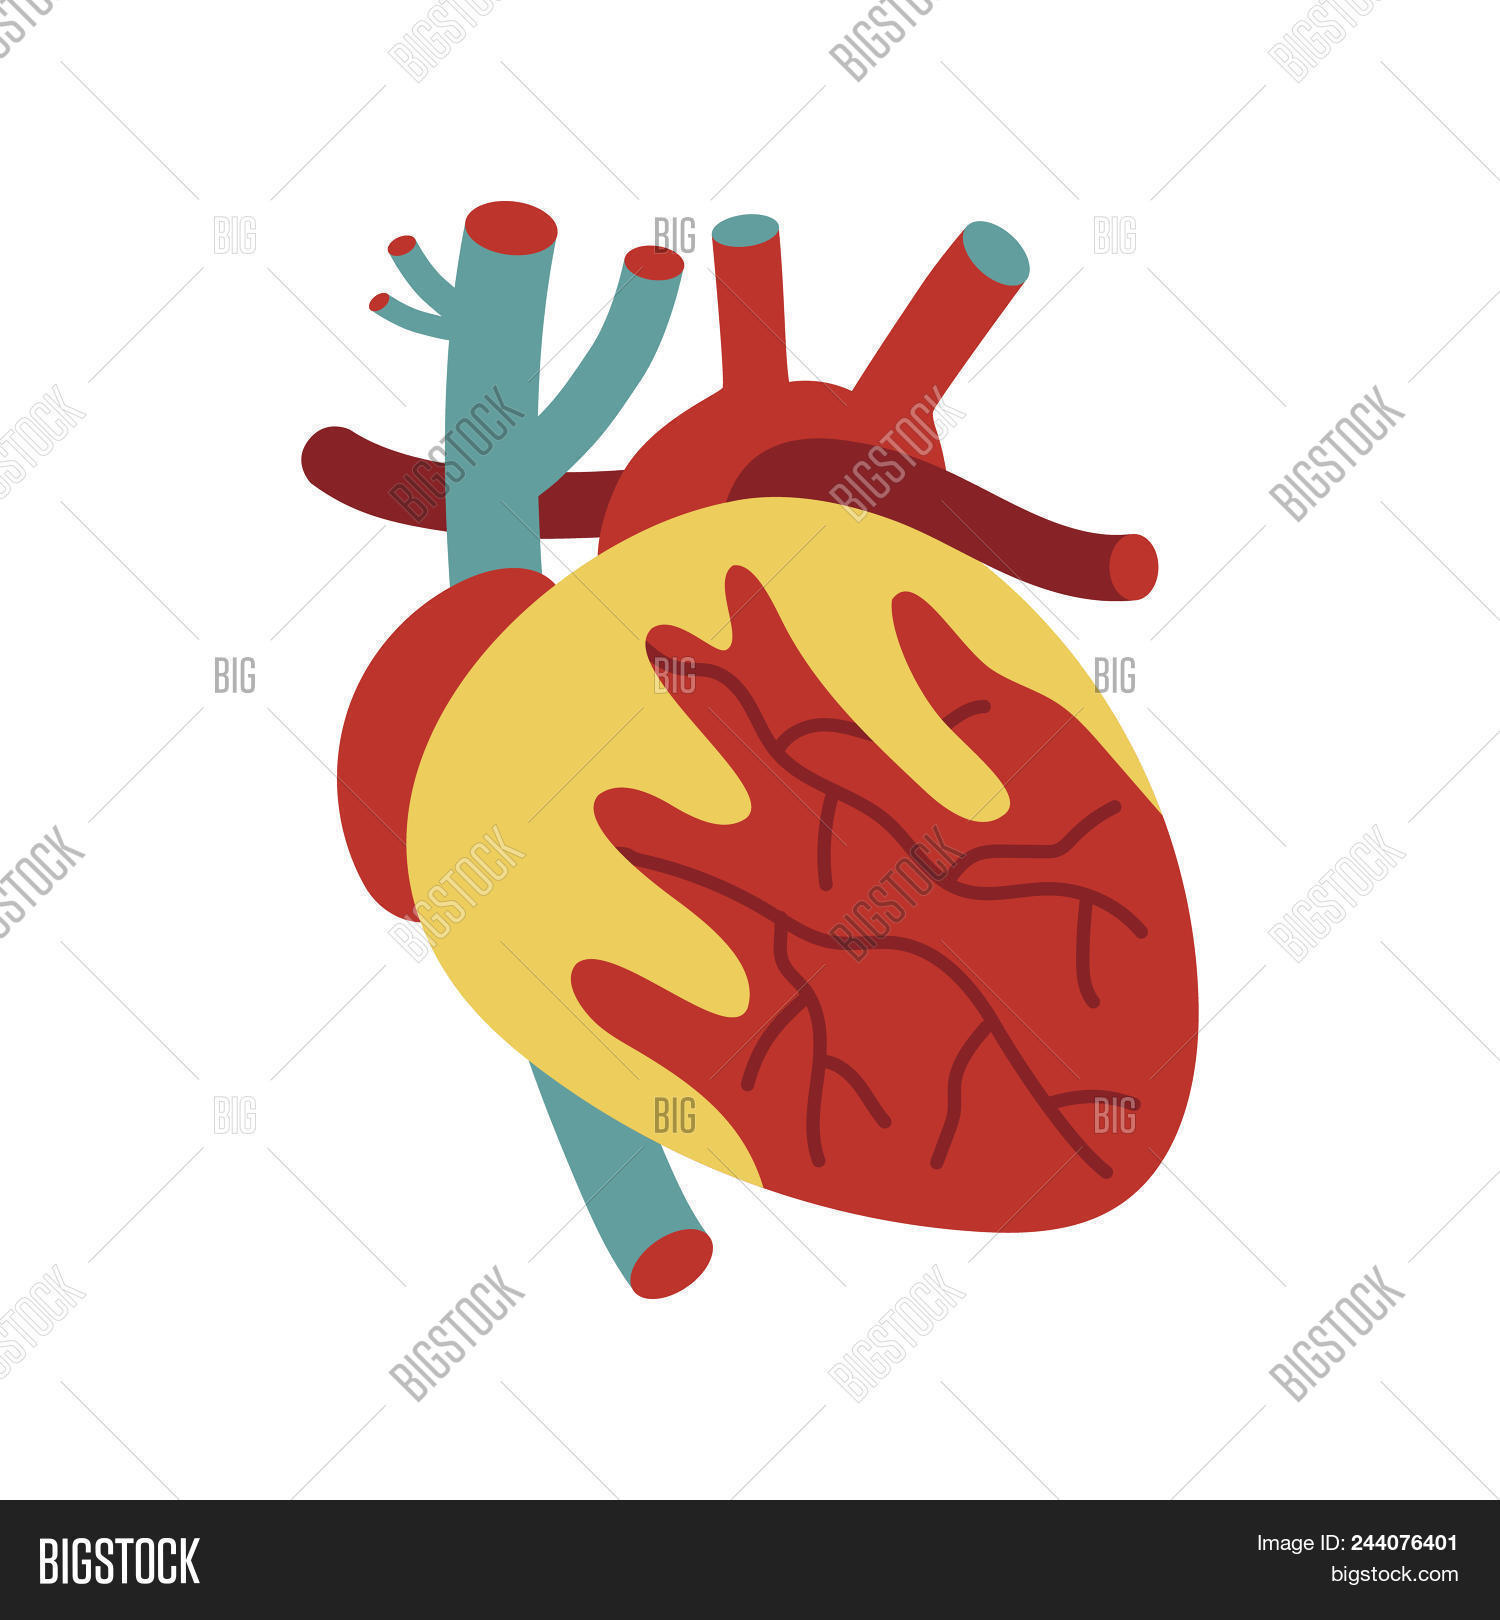 Human Heart Icon Image & Photo (Free Trial) | Bigstock